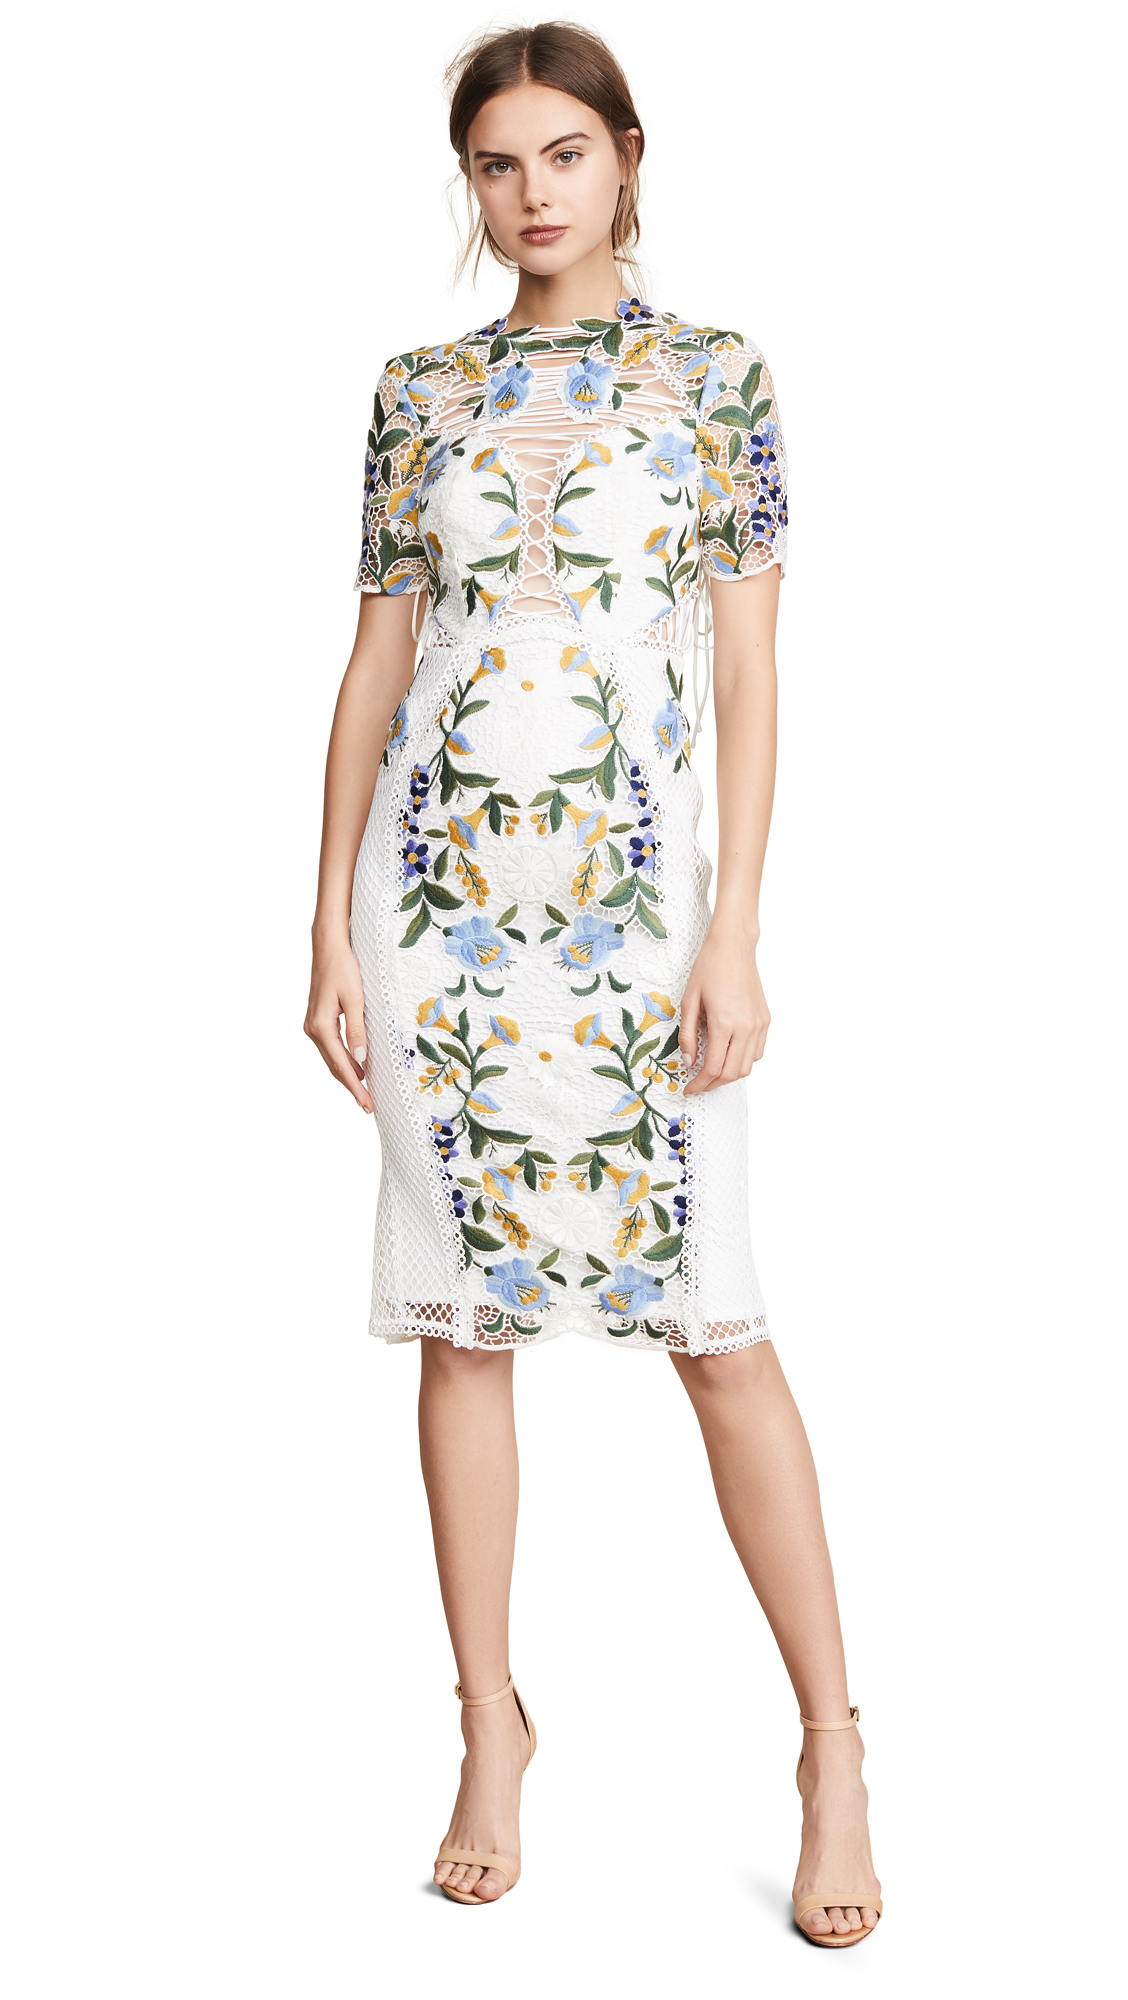 THURLEY Vasette Lace Midi Dress - Blue/Ivory